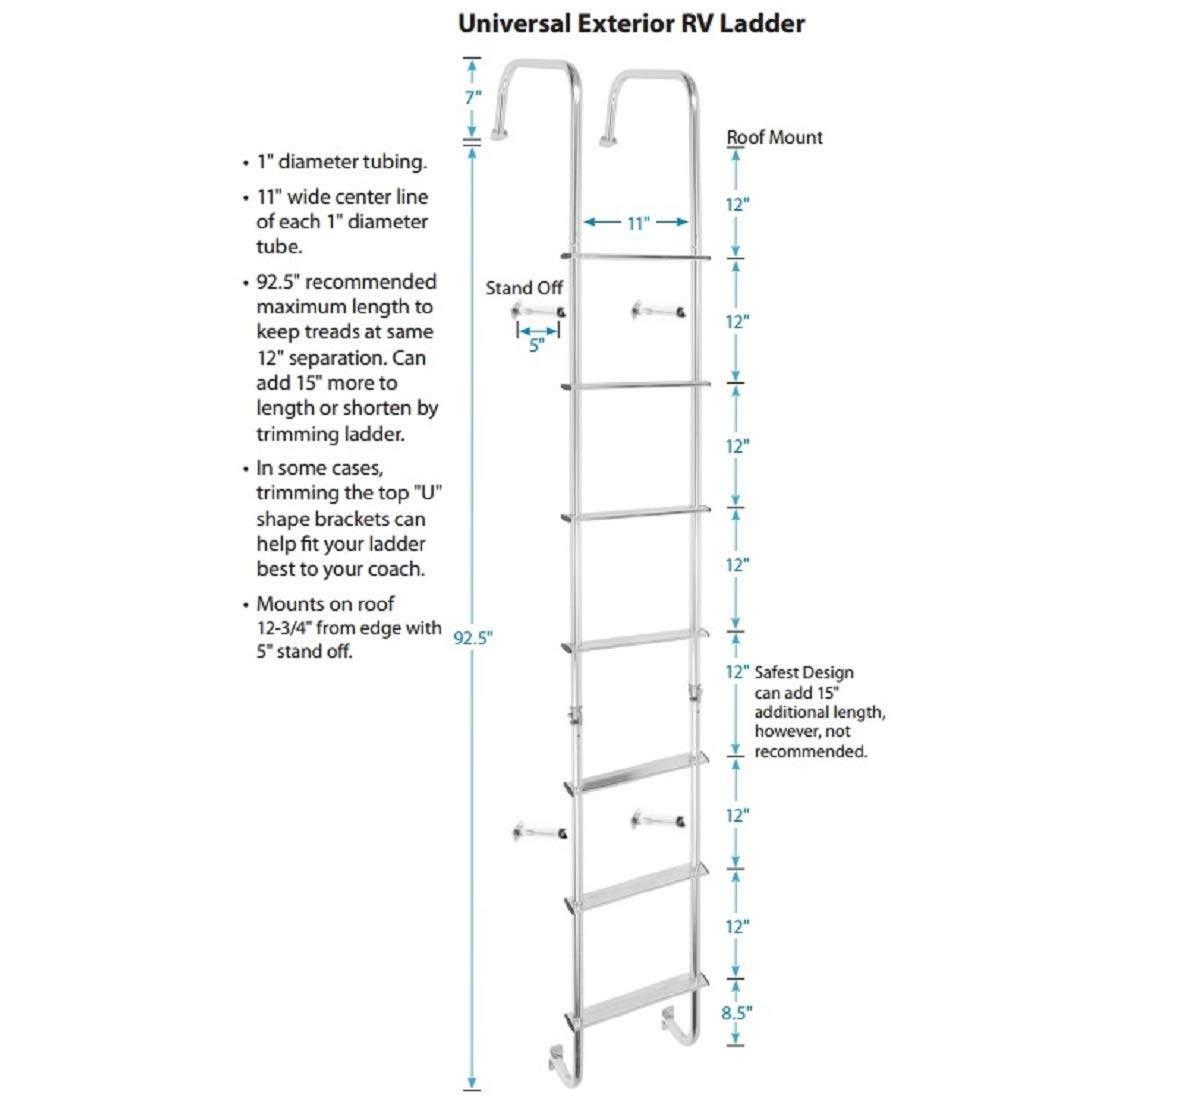 Stromberg Carlson 0139 2100 Silver LA-401 Universal Exterior RV Ladder